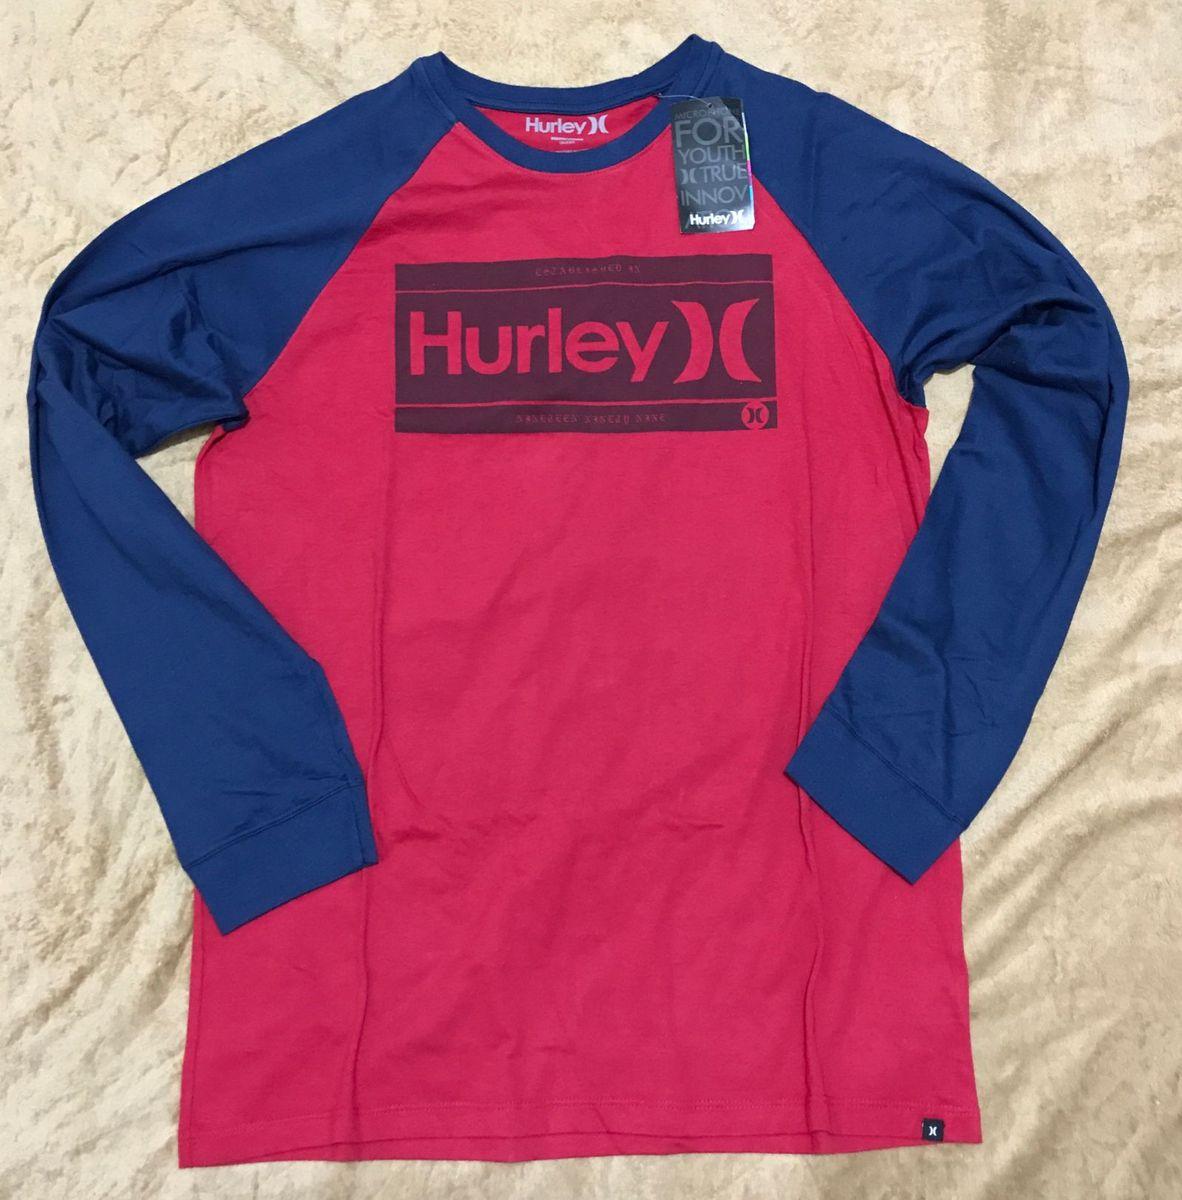 camisa manga longa hurley tam. g - camisas hurley 2eea9ae24da7b